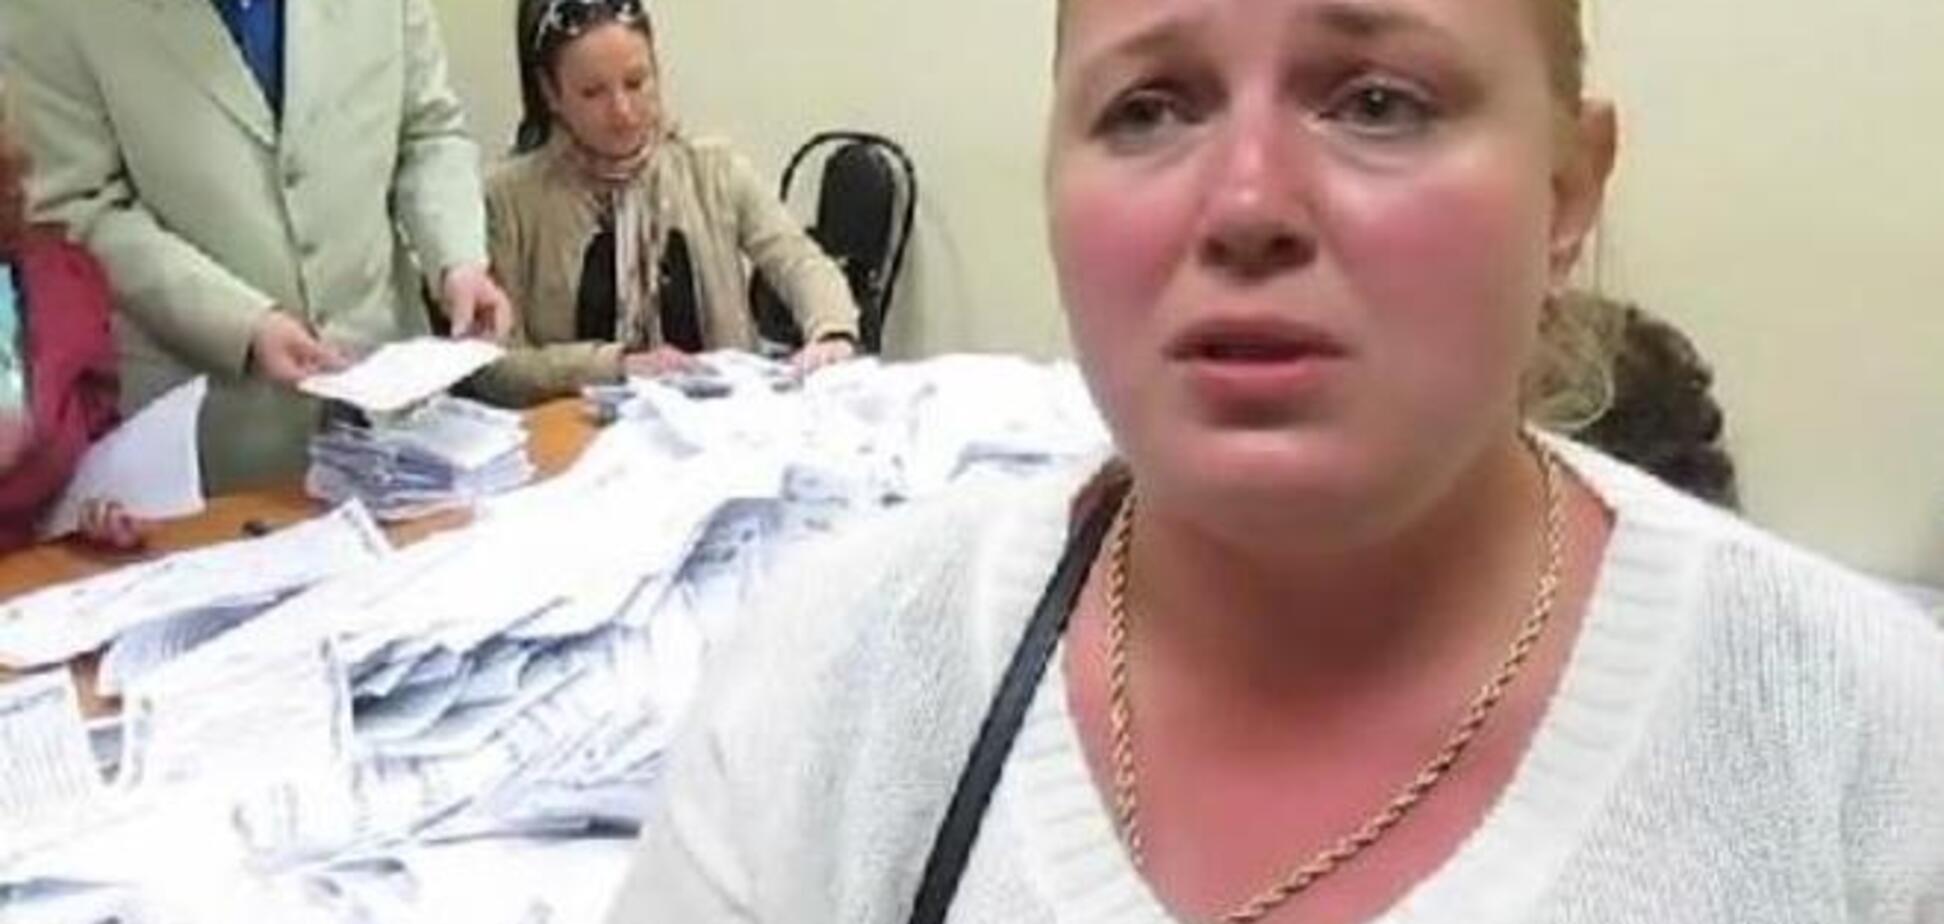 Гастролерша-сепаратистка Ципко руководила псевдореферендумом в Москве. Видеофакт